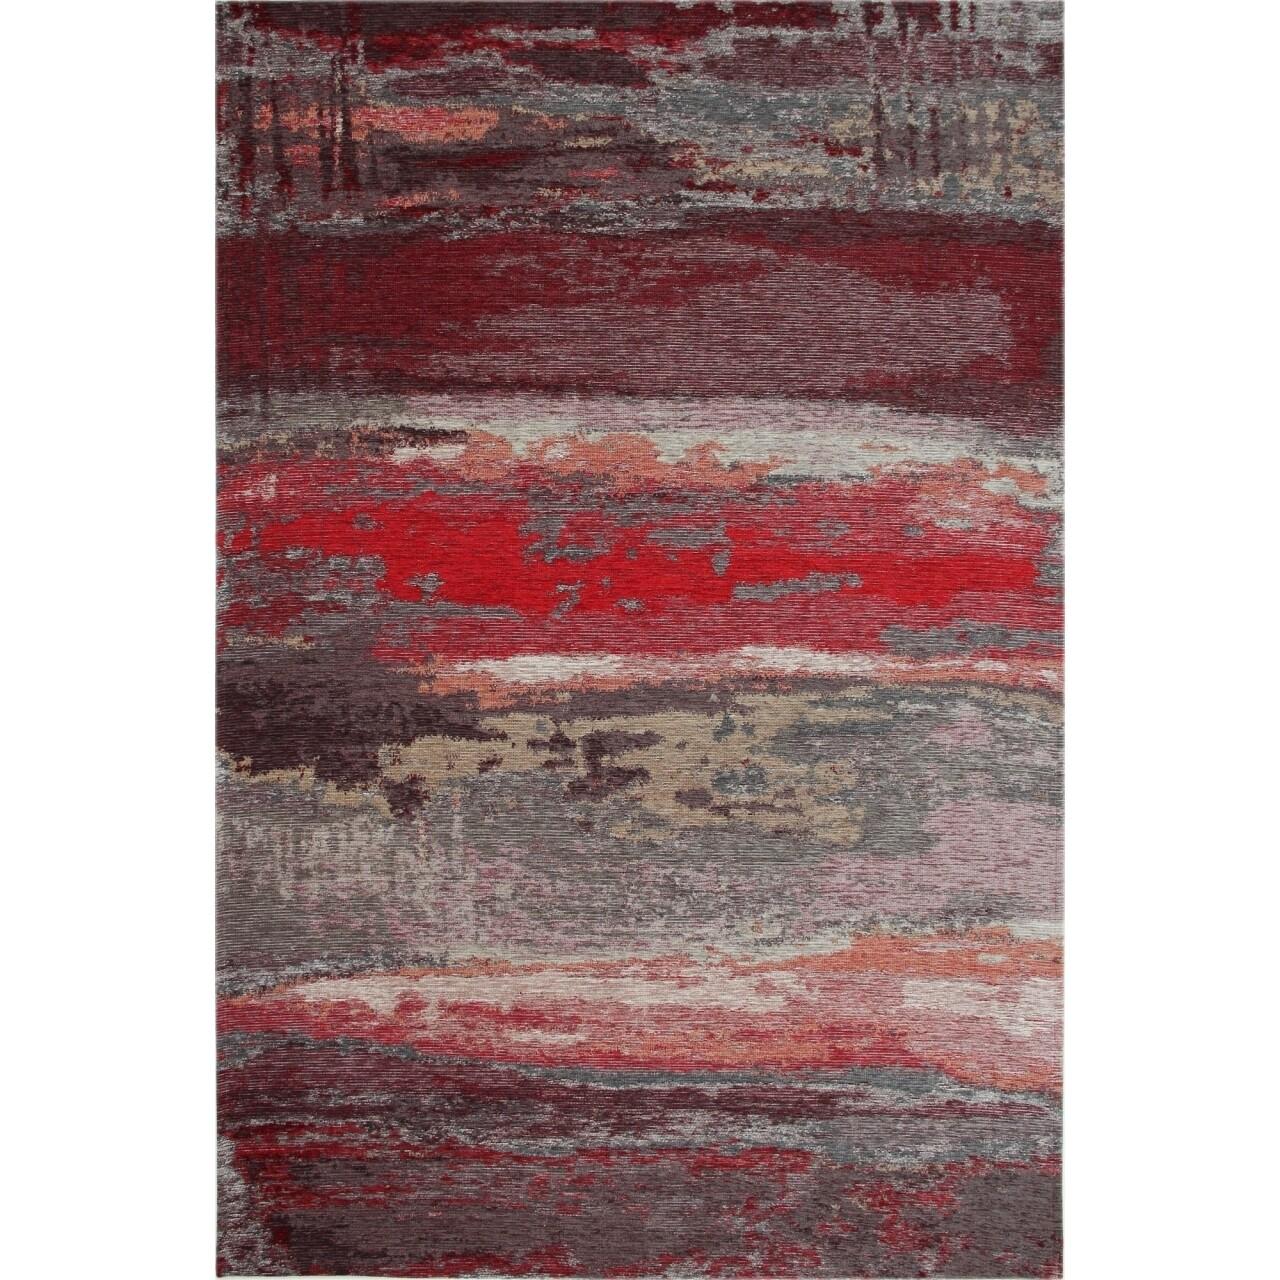 Covor rezistent Eko, SM 12 - Grey, Red XW, 100% acril,  120 x 180 cm